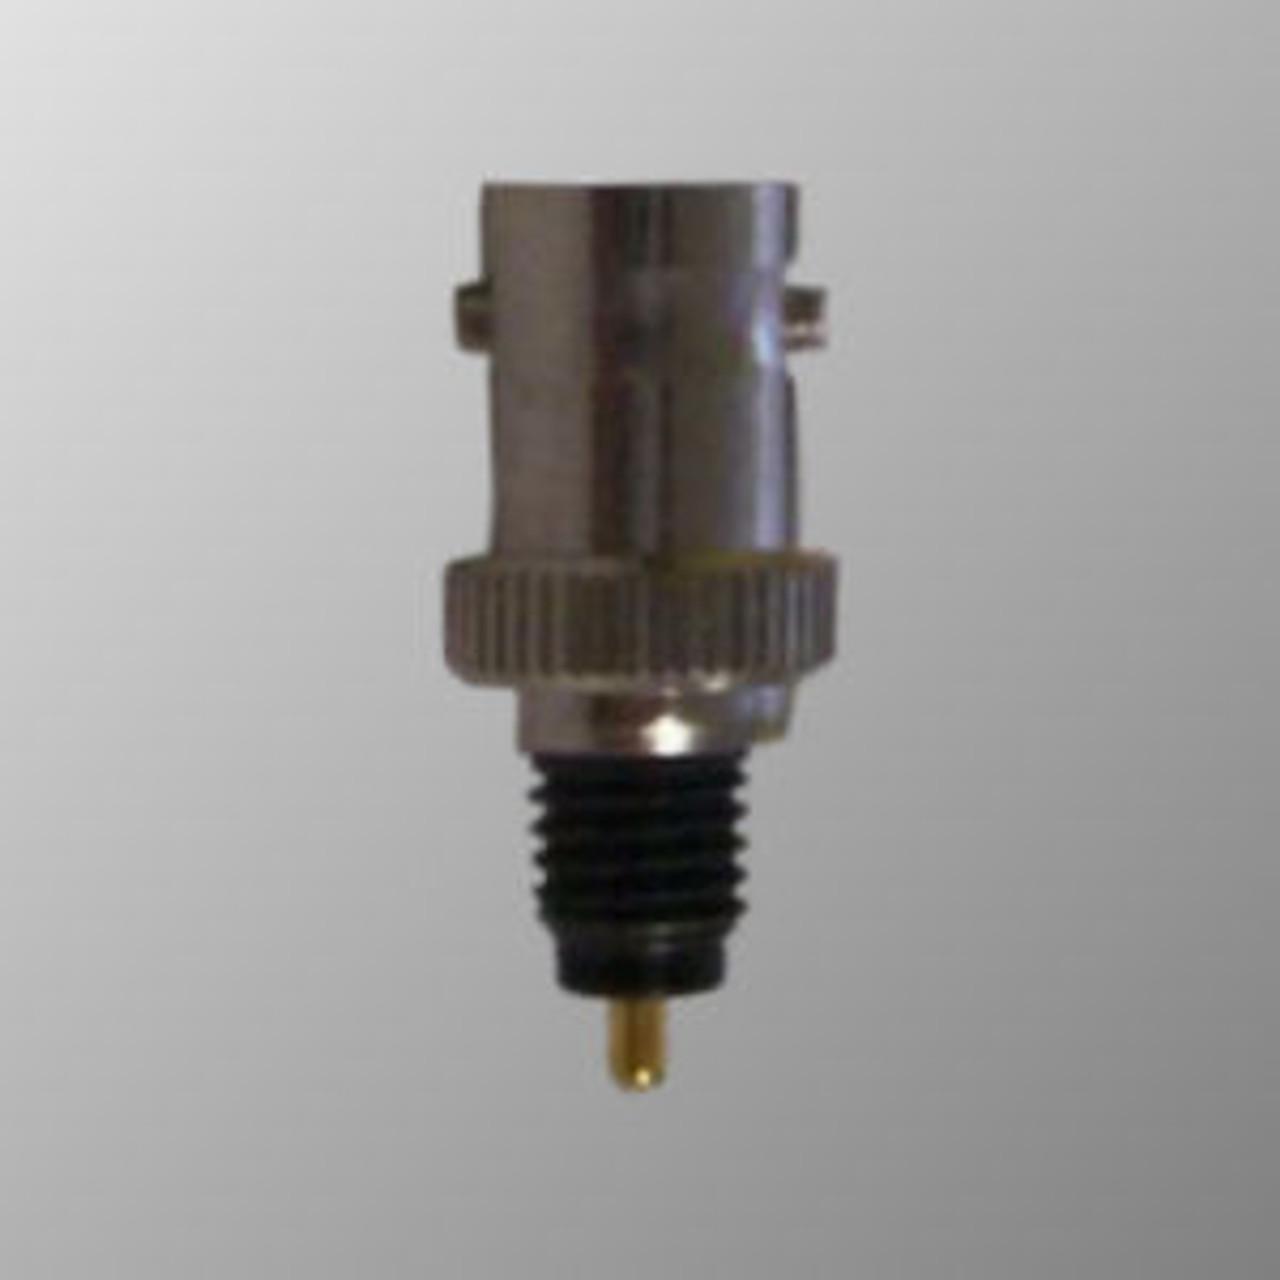 Harris MRK VHF/UHF Long Range External Mag Mount Antenna Kit- 132-525MHz